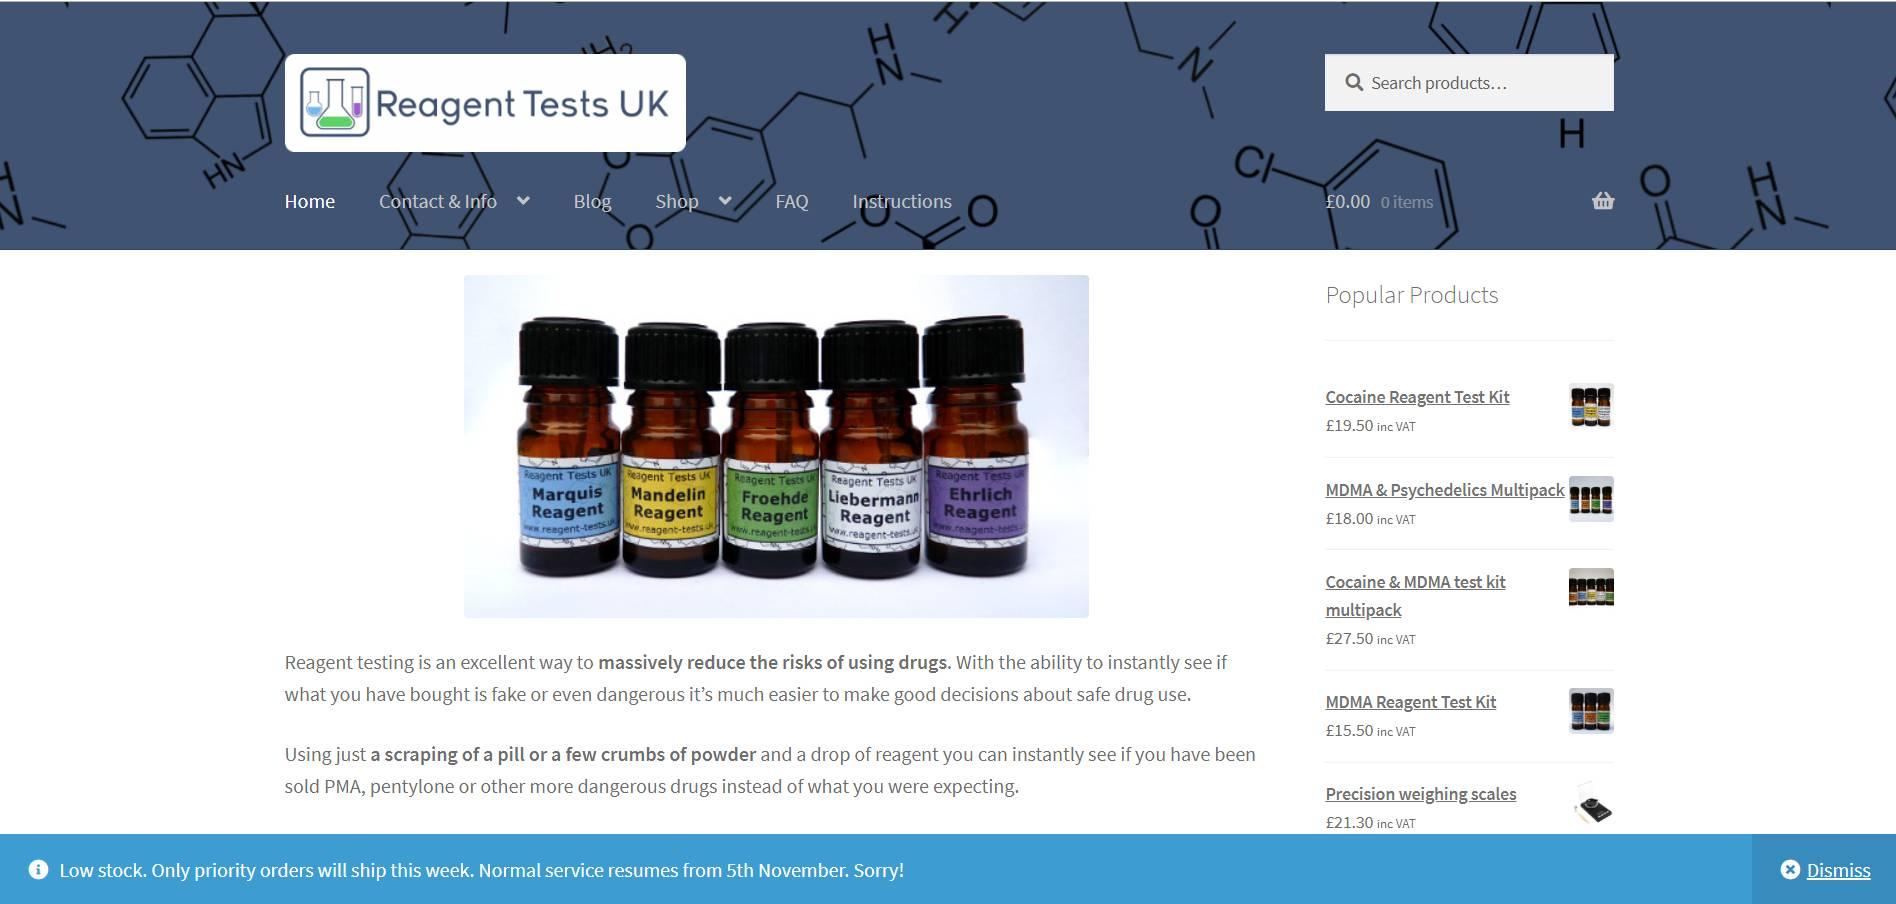 Reagent Tests UK